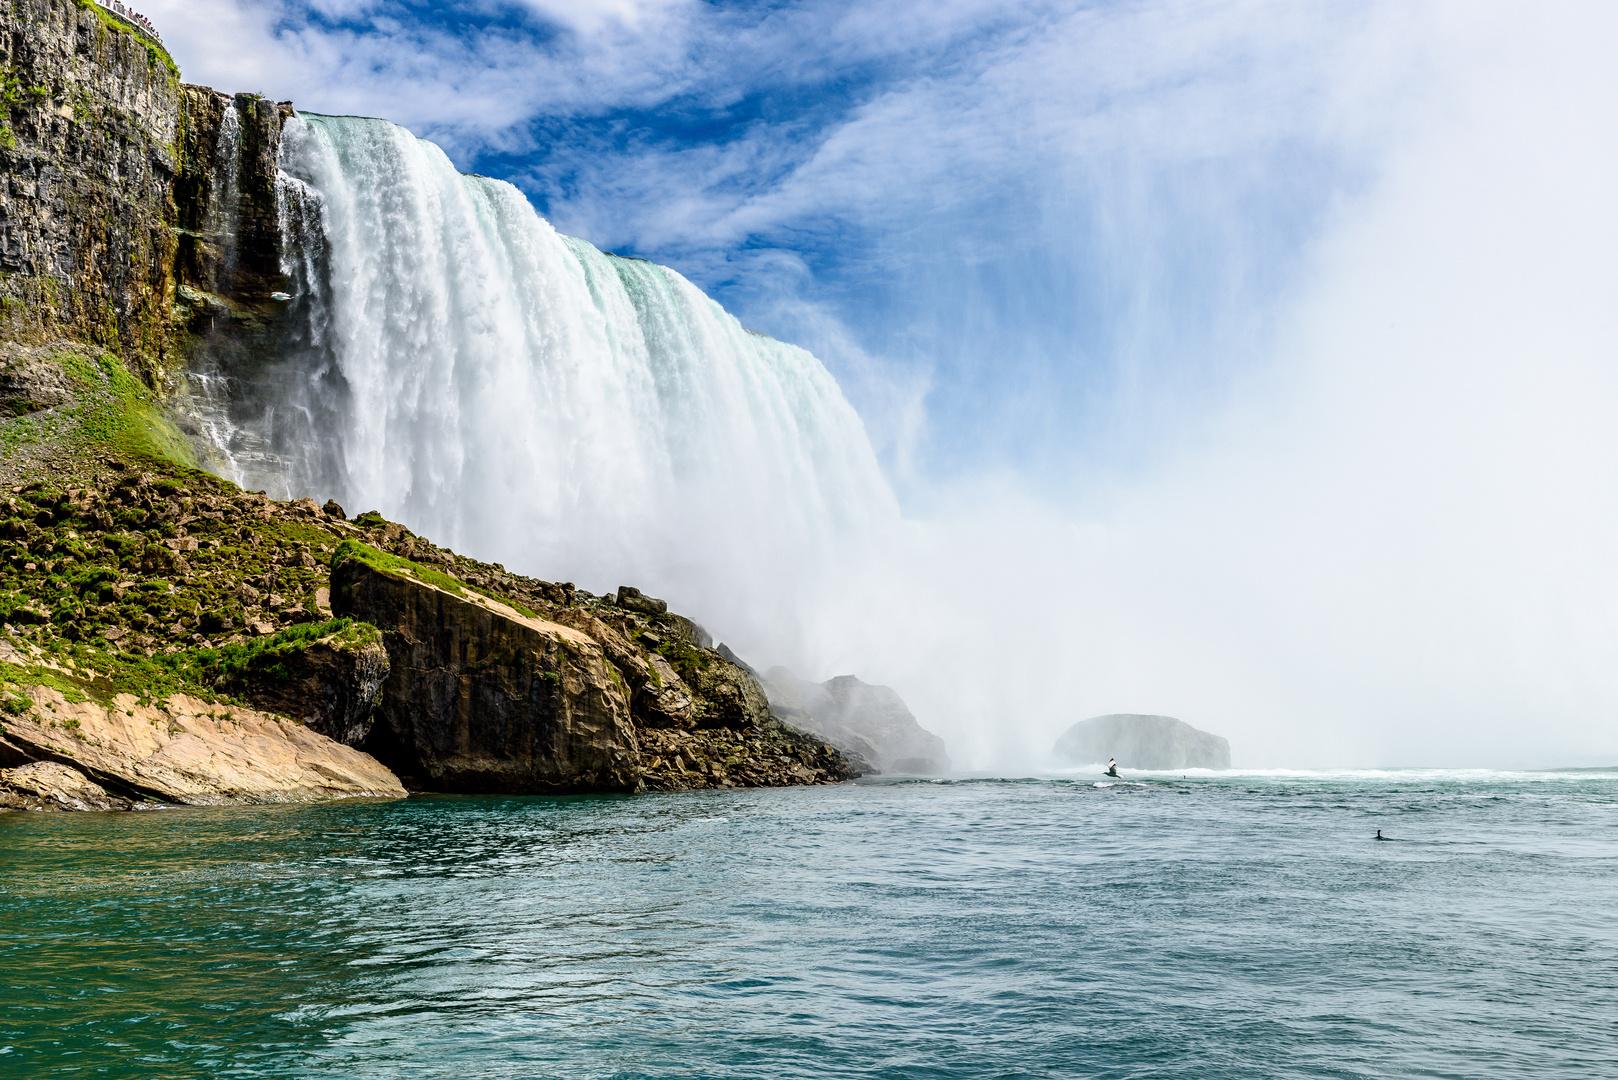 Niagarafälle – Horseshoe Falls, Niagara Falls, Kanada